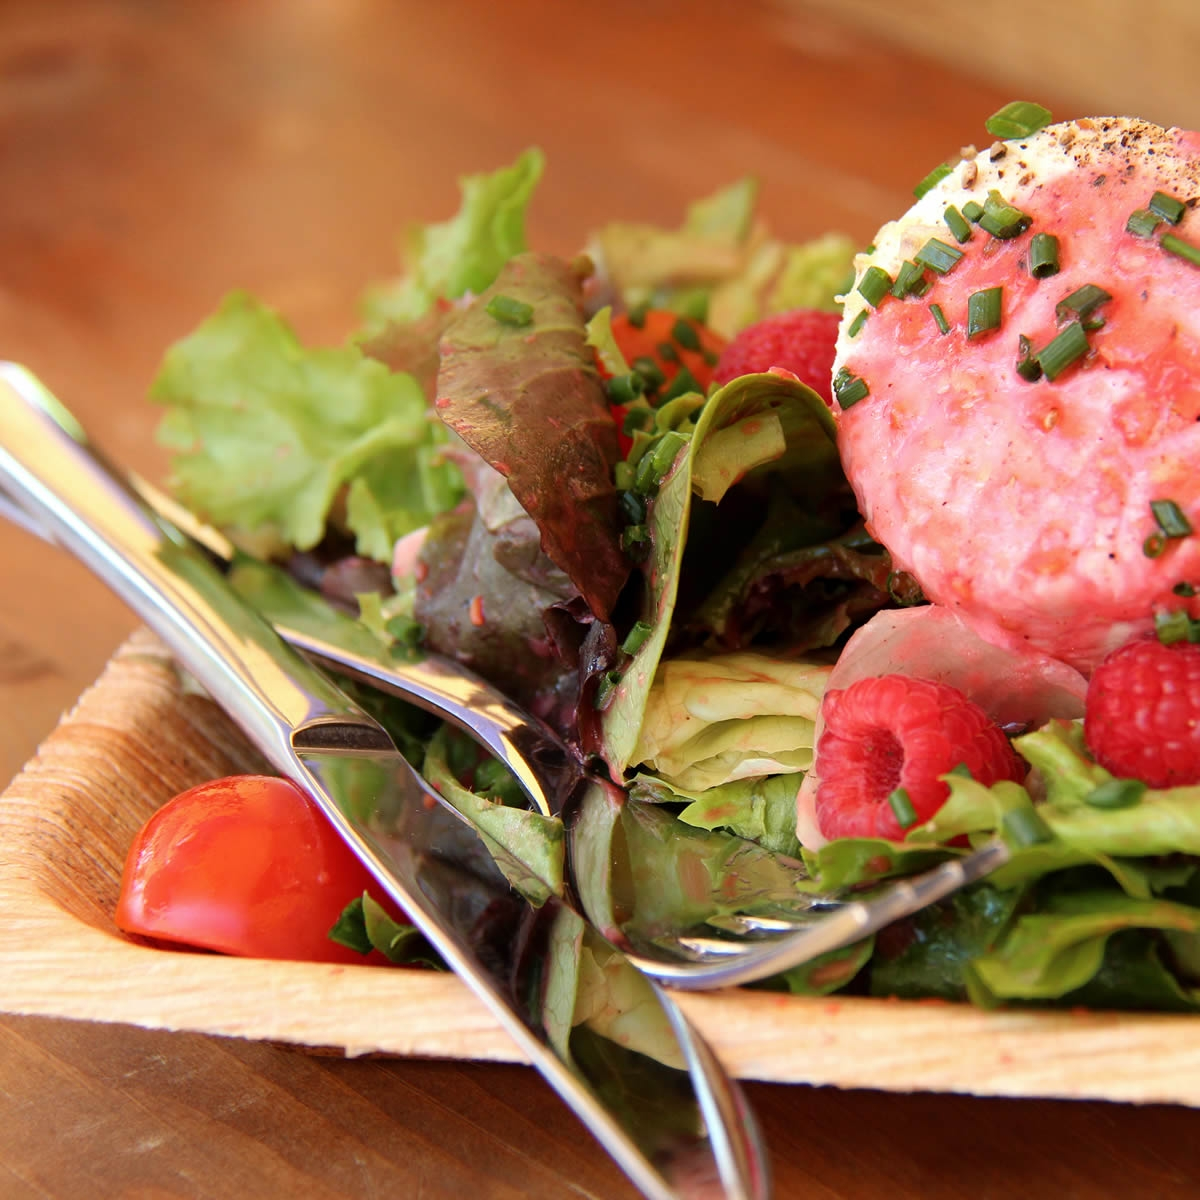 Blattsalat mit Tomaten, Himbeeren und frischen Kräutern